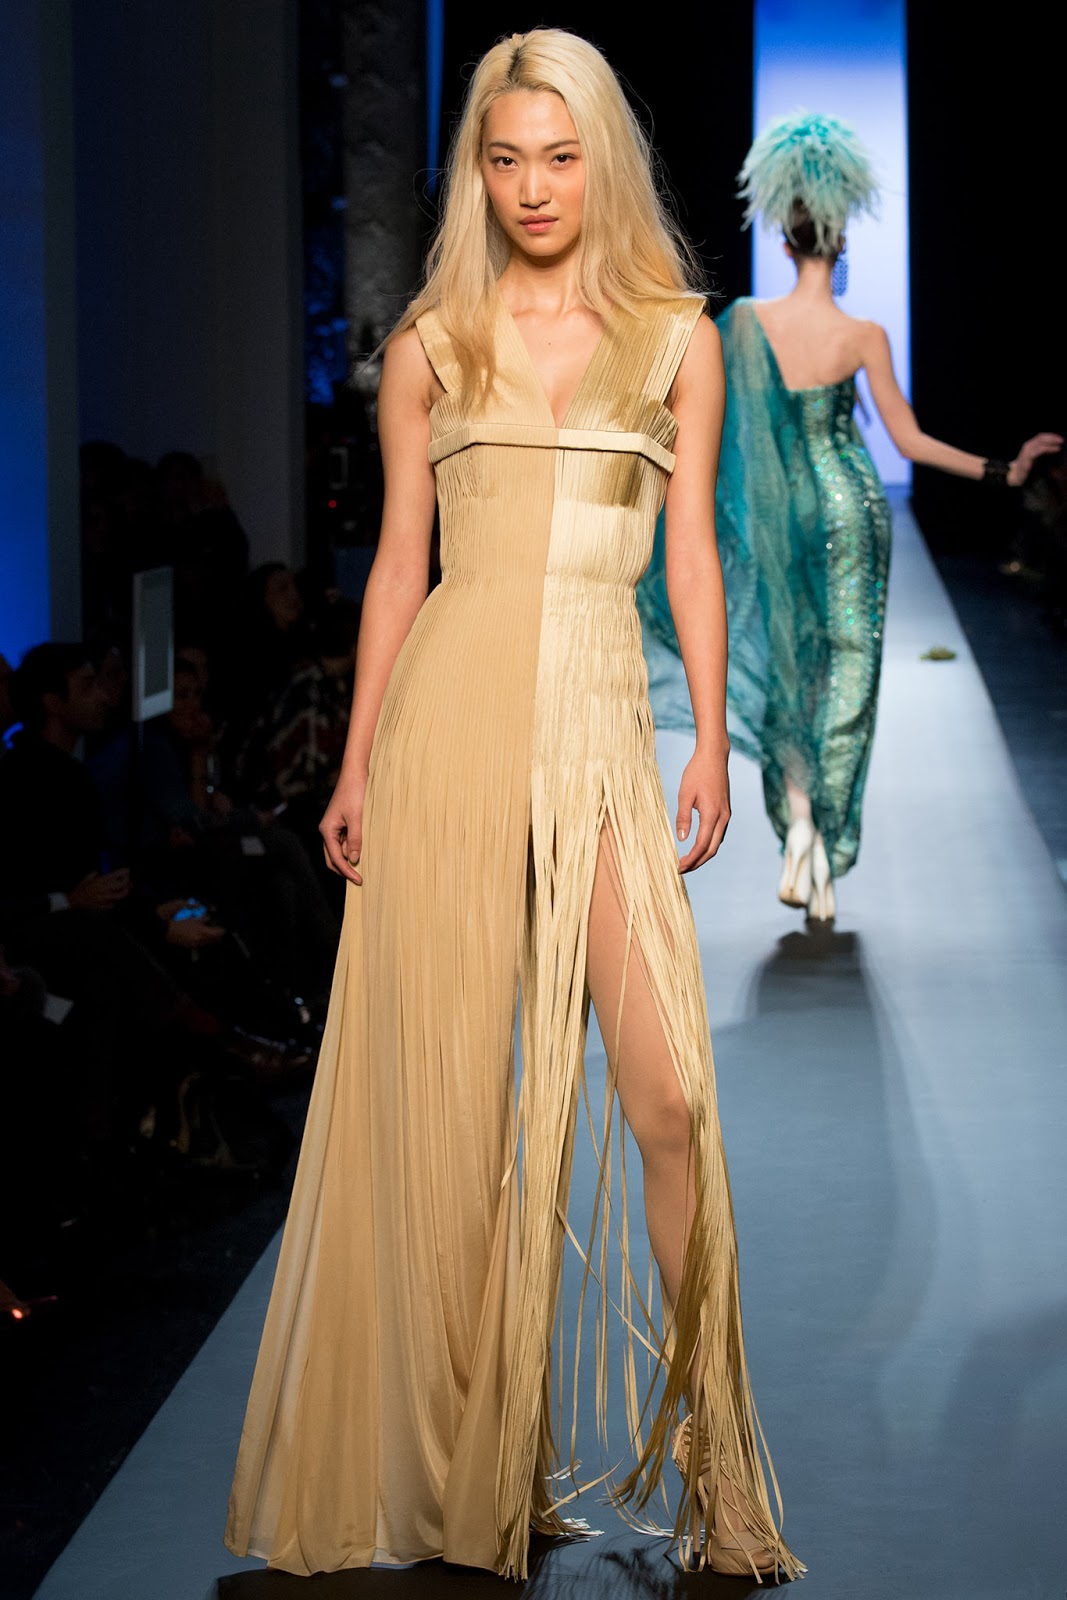 jean paul gaultier haute couture s s 15 paris visual optimism fashion editorials shows. Black Bedroom Furniture Sets. Home Design Ideas